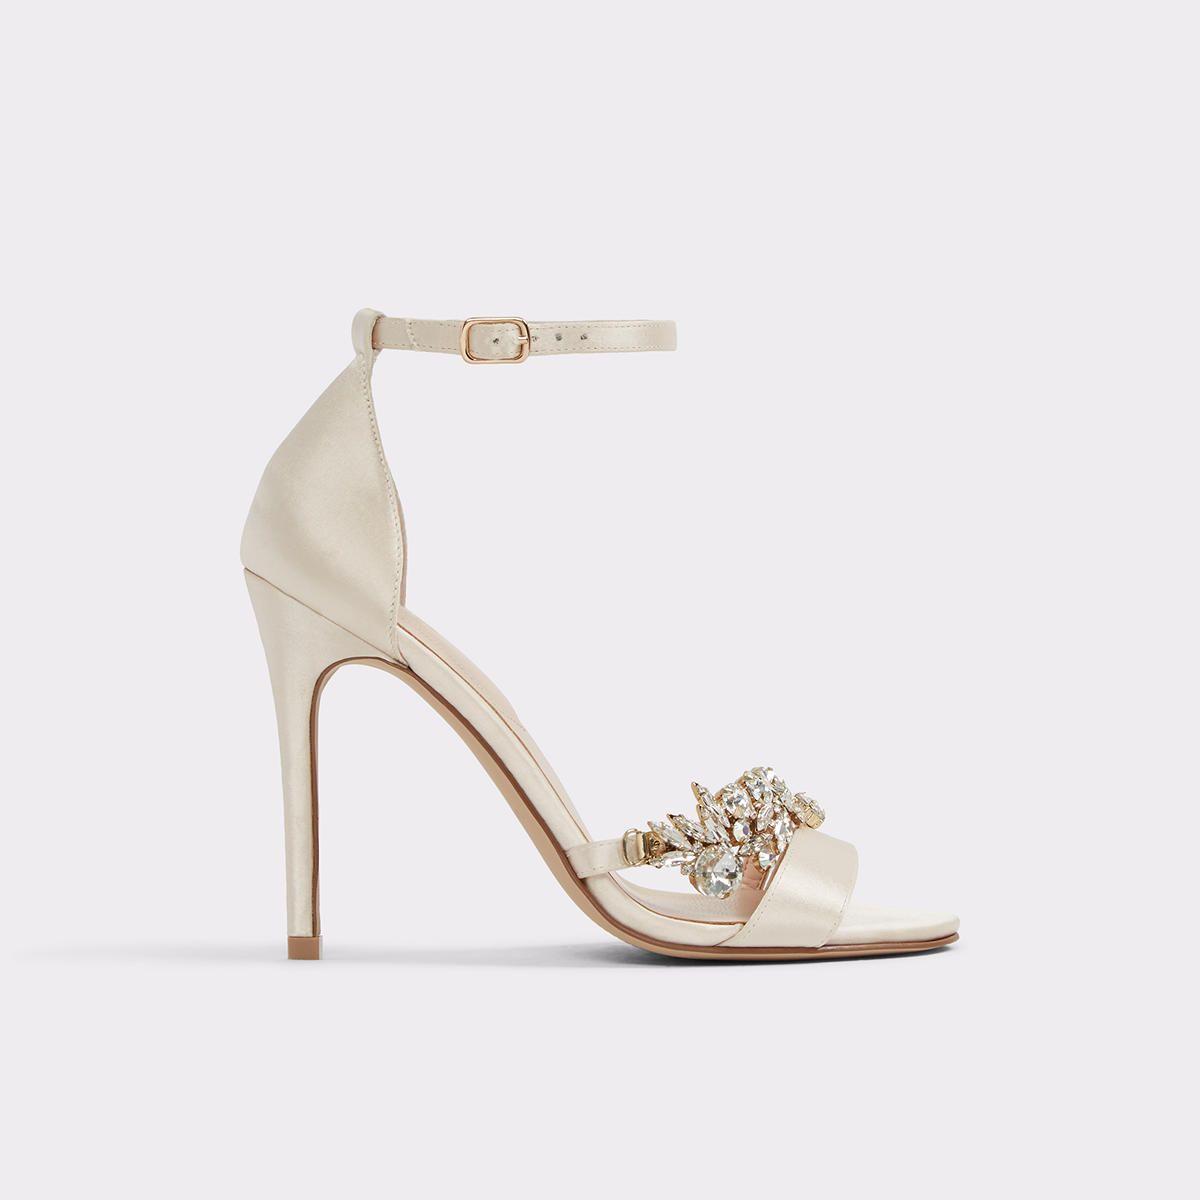 Bridal Shoes Aldo: Affordable Wedding Shoes